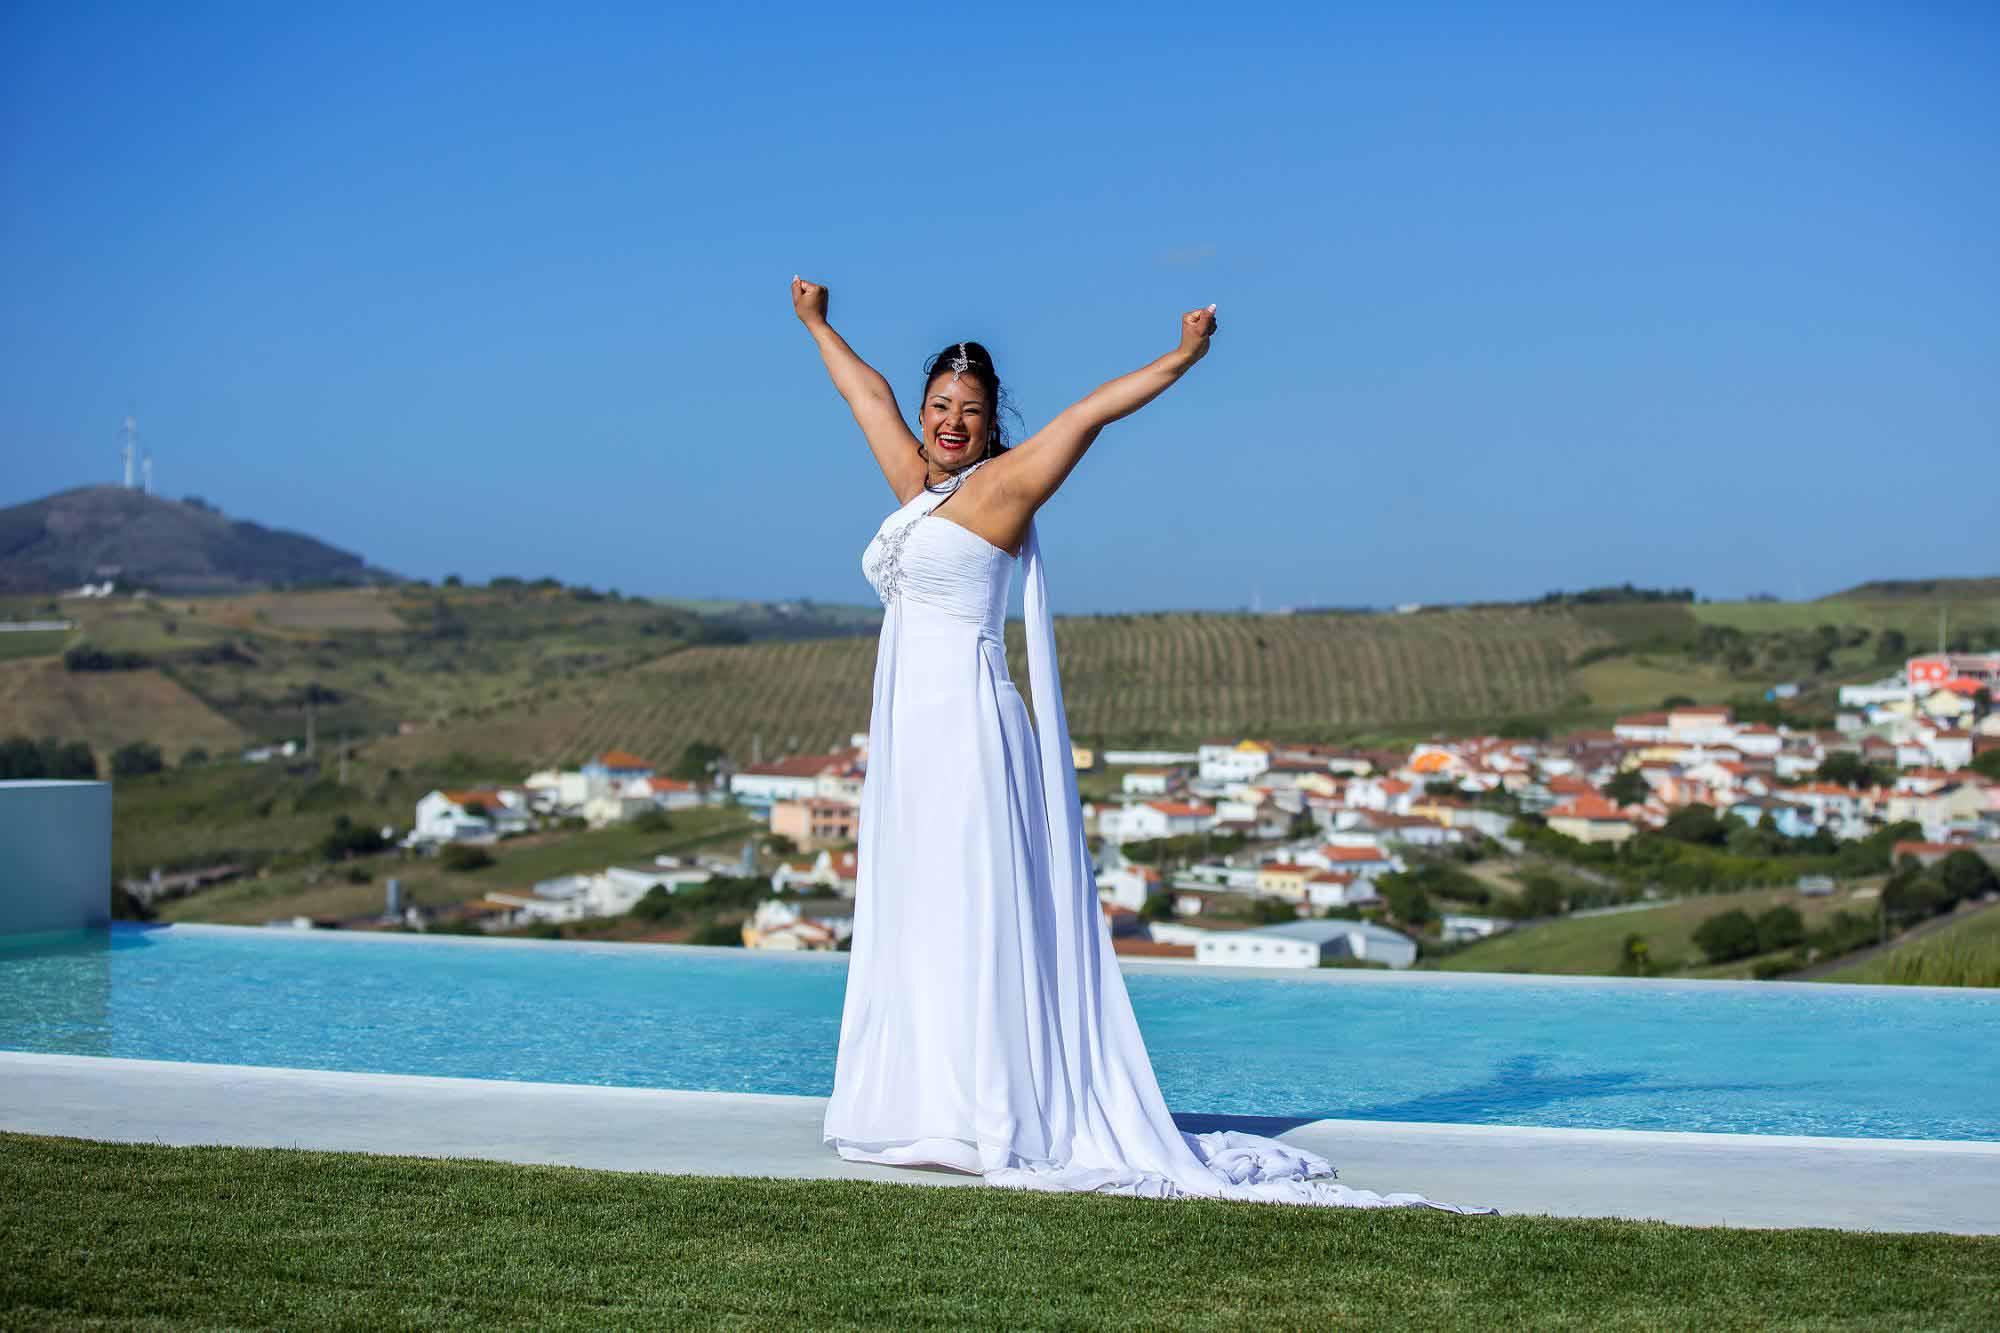 Portugal-Wedding-Photographer-106.jpg